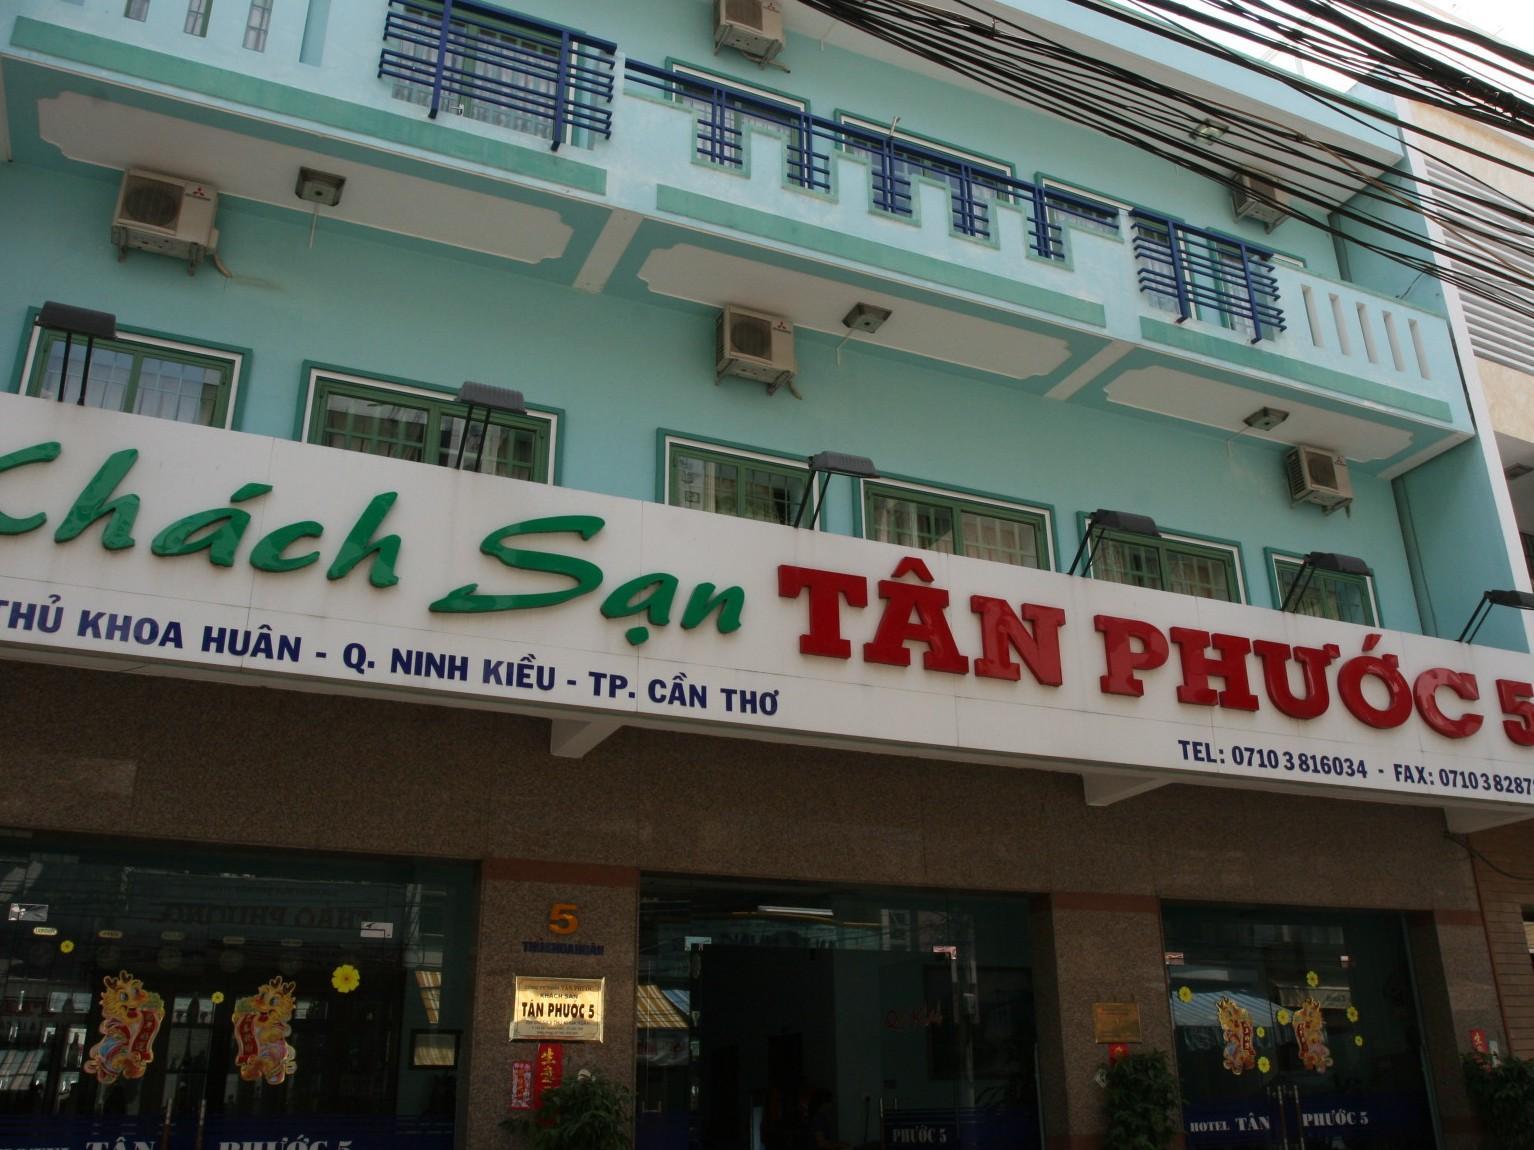 Tan Phuoc 5 Hotel - Hotell och Boende i Vietnam , Can Tho